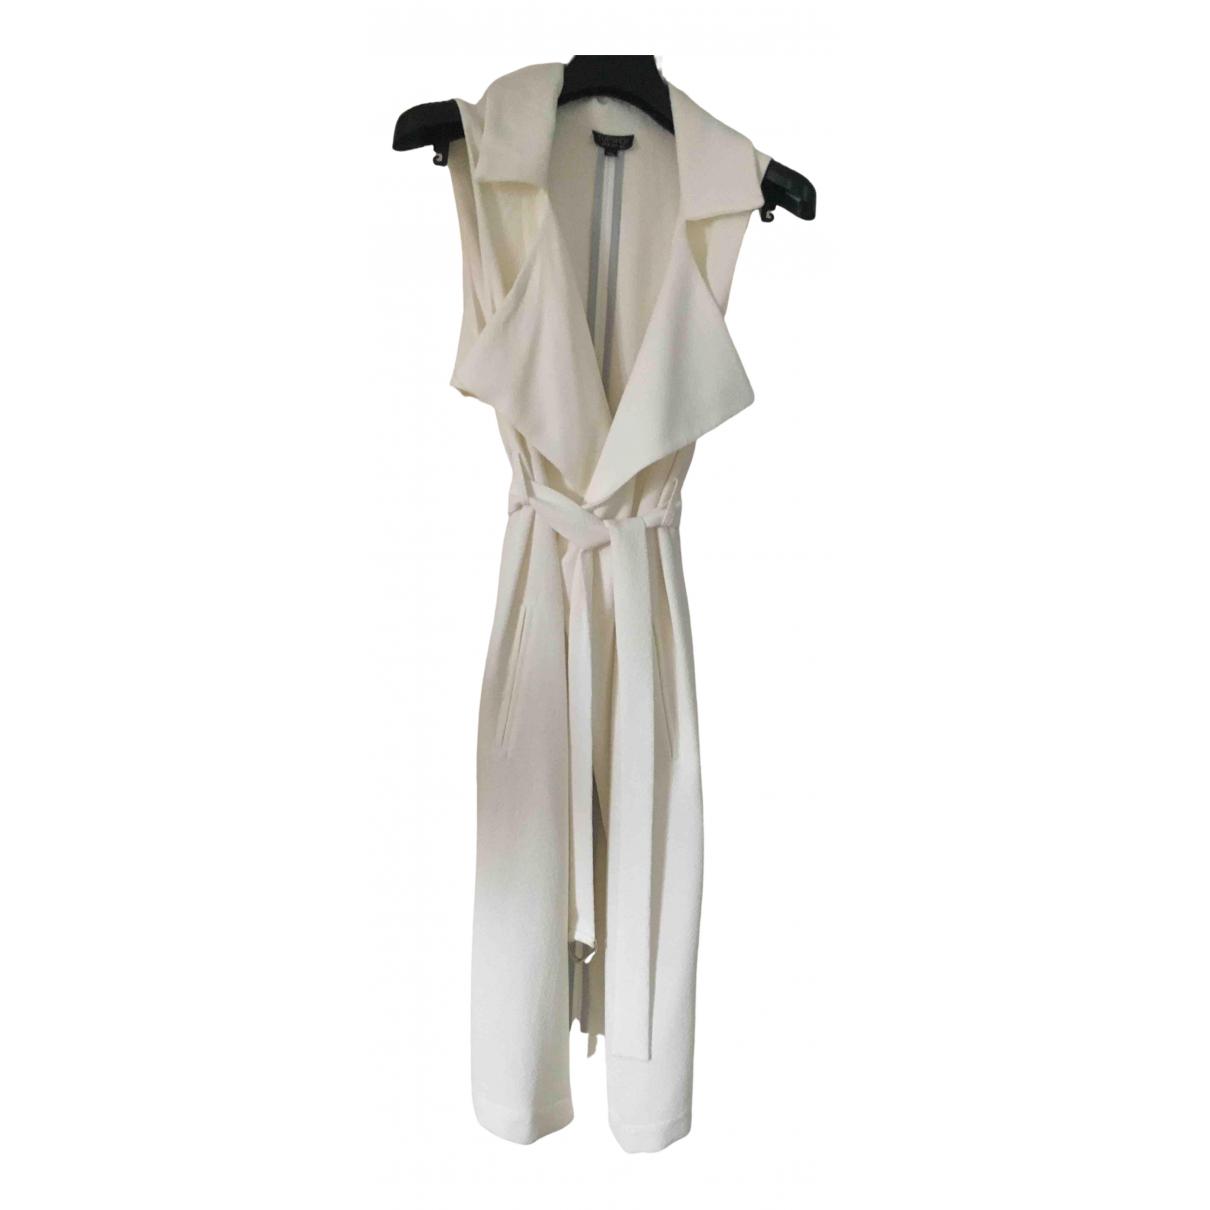 tophop N Ecru dress for Women 8 UK